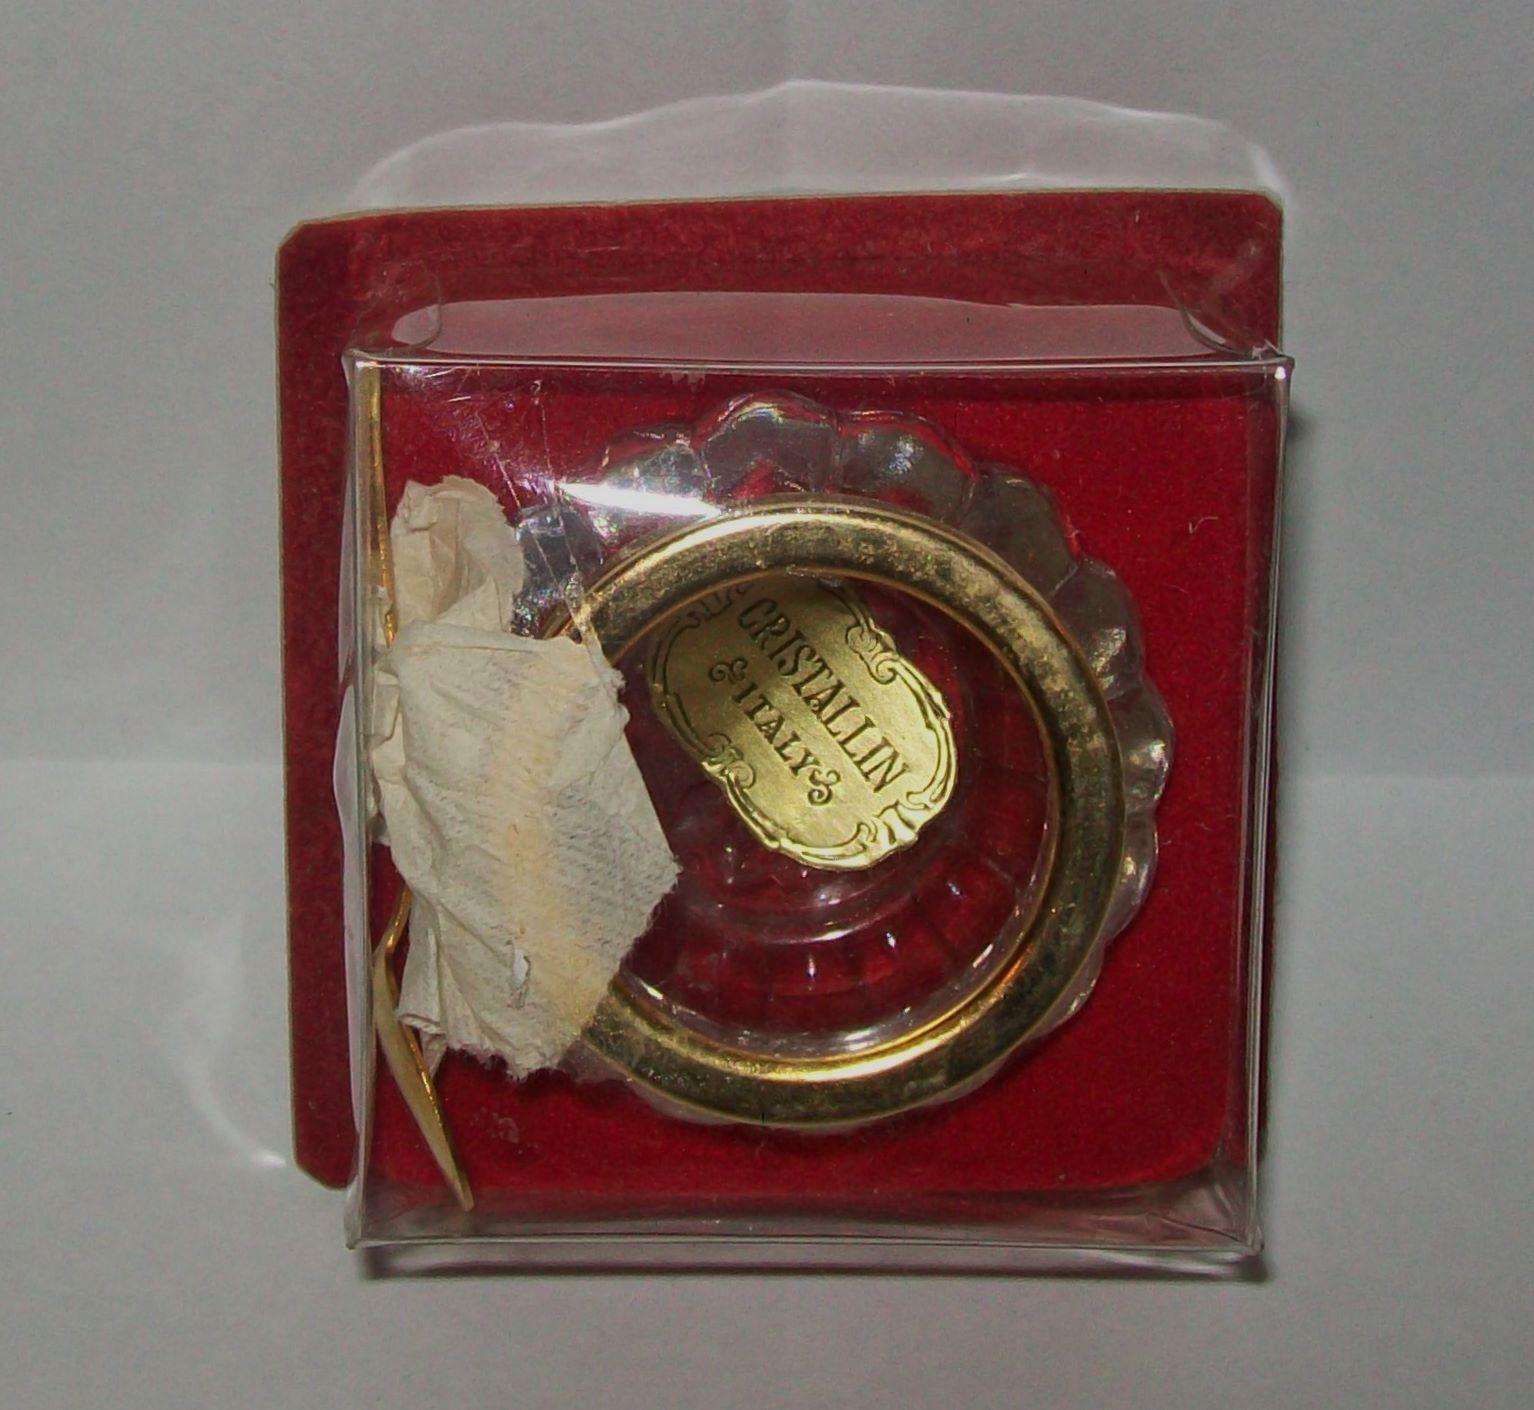 VINTAGE 'CRISTALLIN ITALY' GLASS SALT/MUSTARD POT gold-tone edge+spoon in box